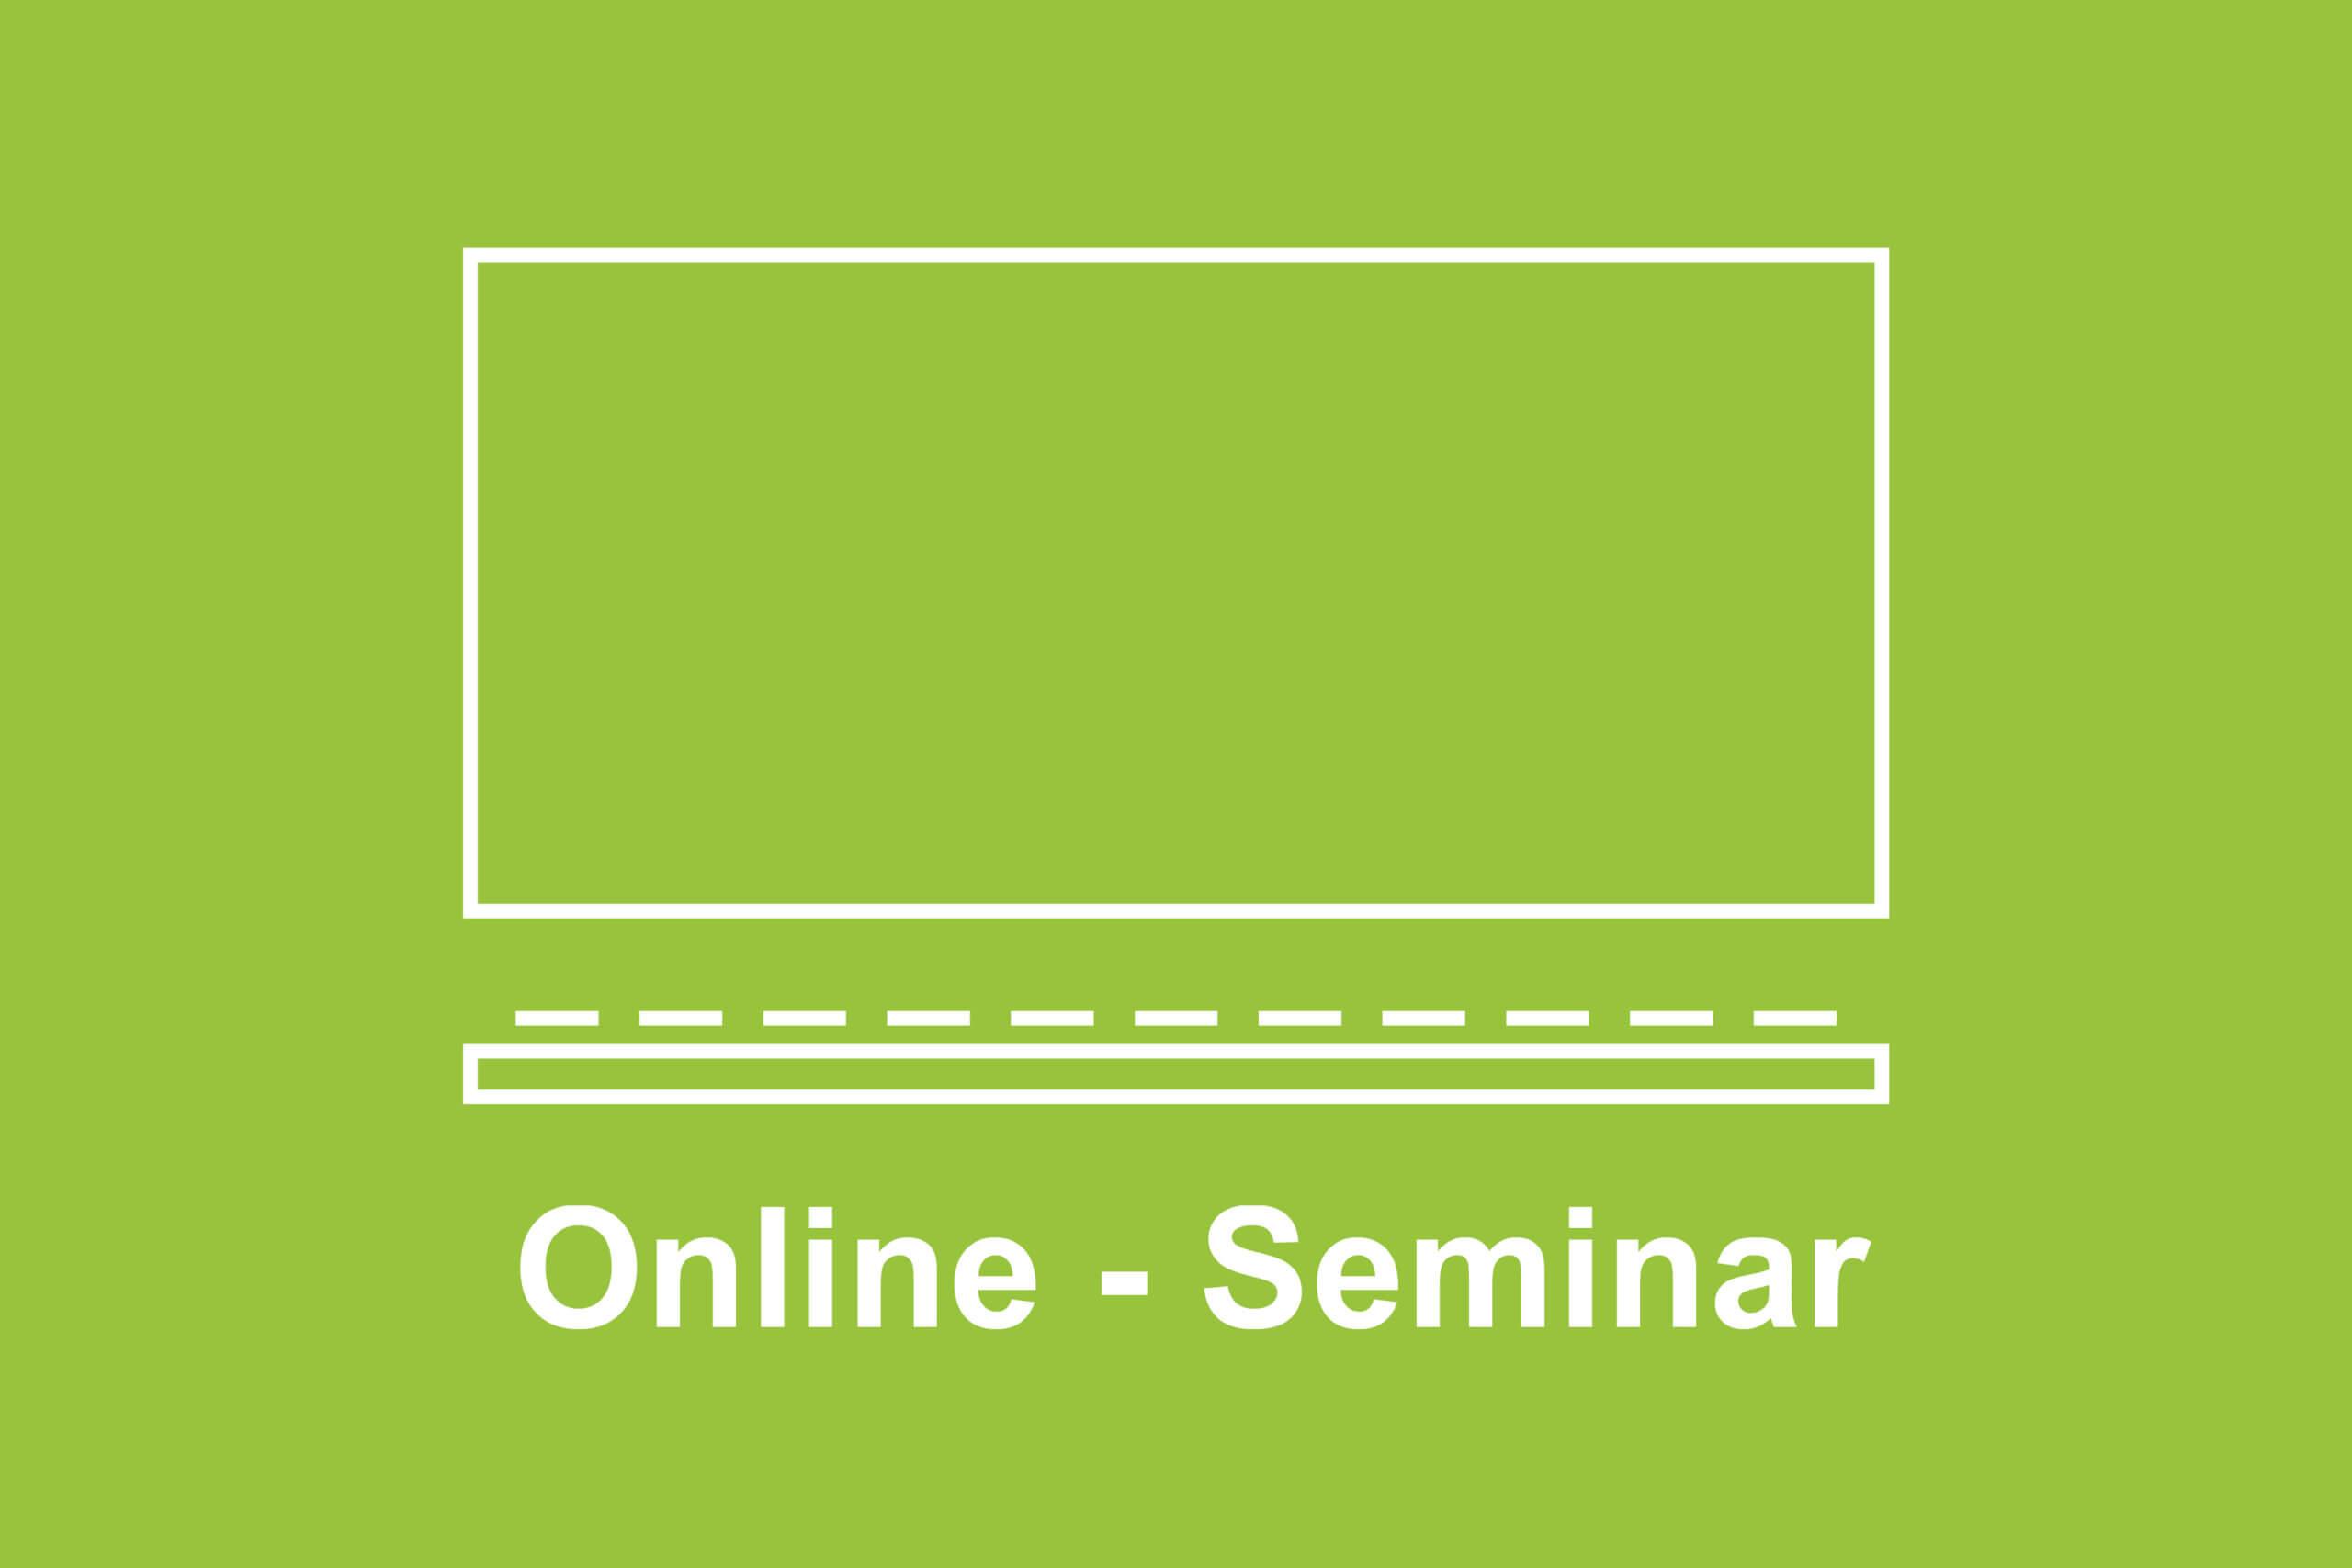 KIN-Expert-Online-Seminar: Qualitätsmanagementbeauftragte in der Lebensmittelbranche